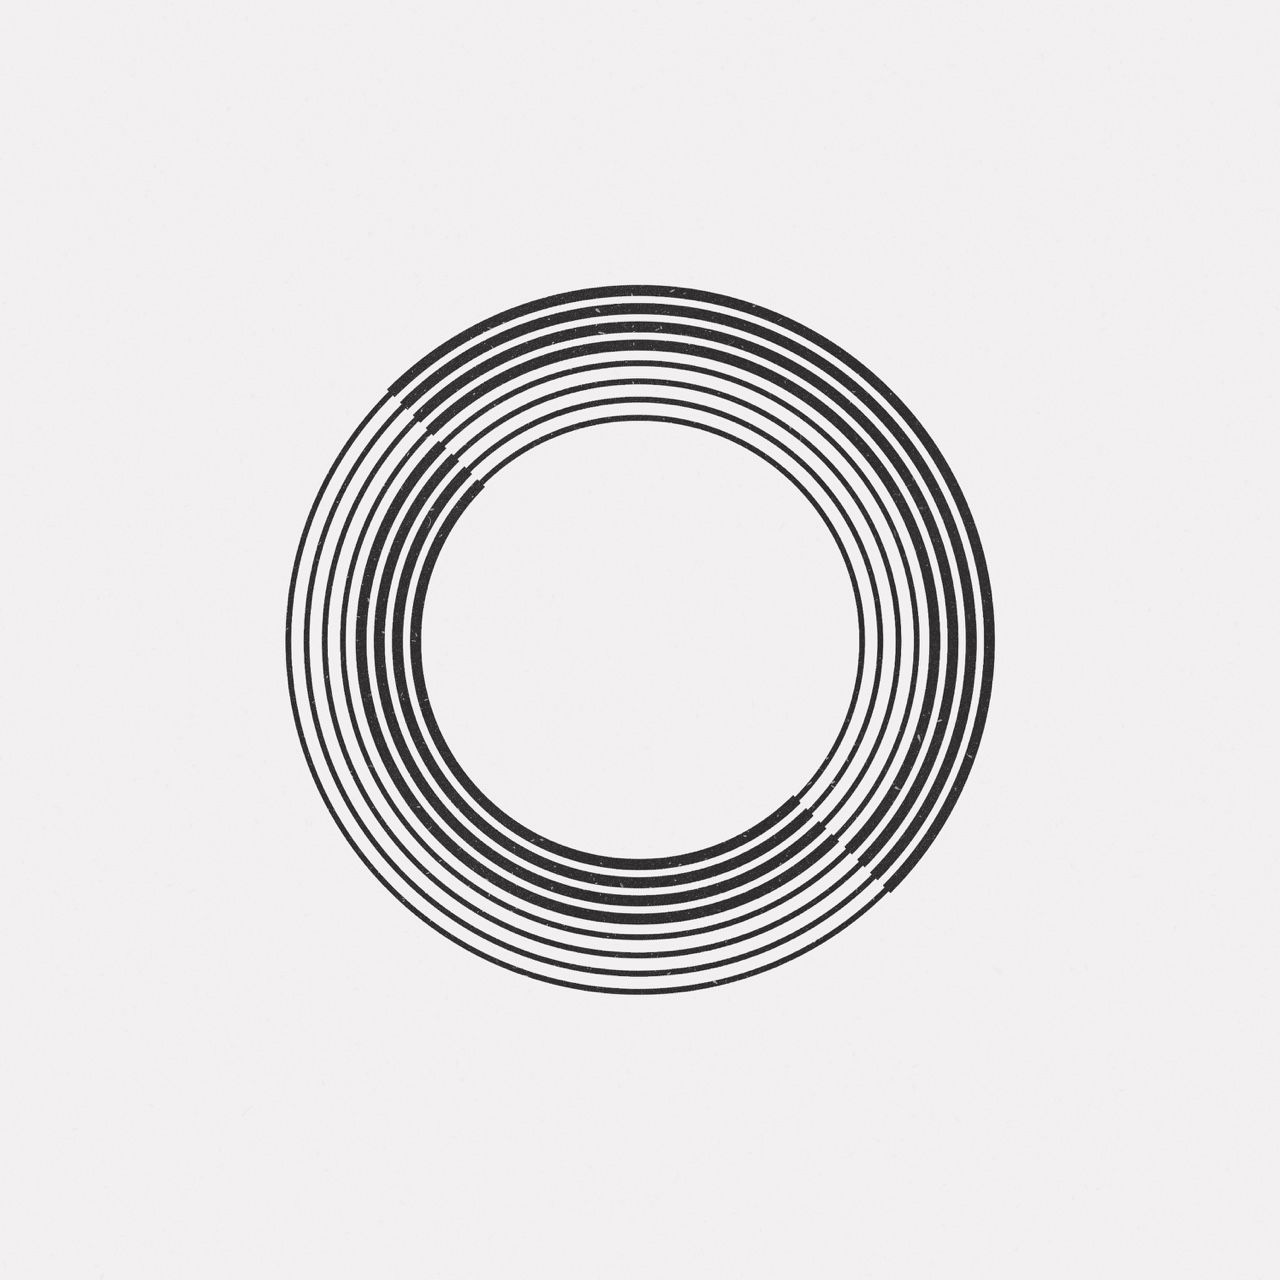 #MI16-573 A new geometric design every day